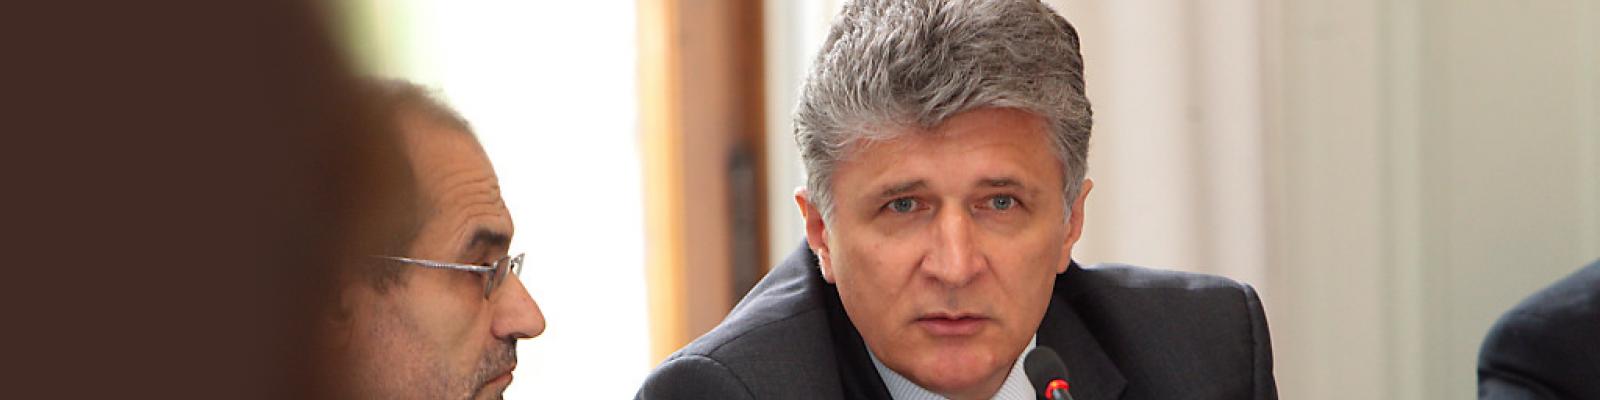 Miroslav Jenca